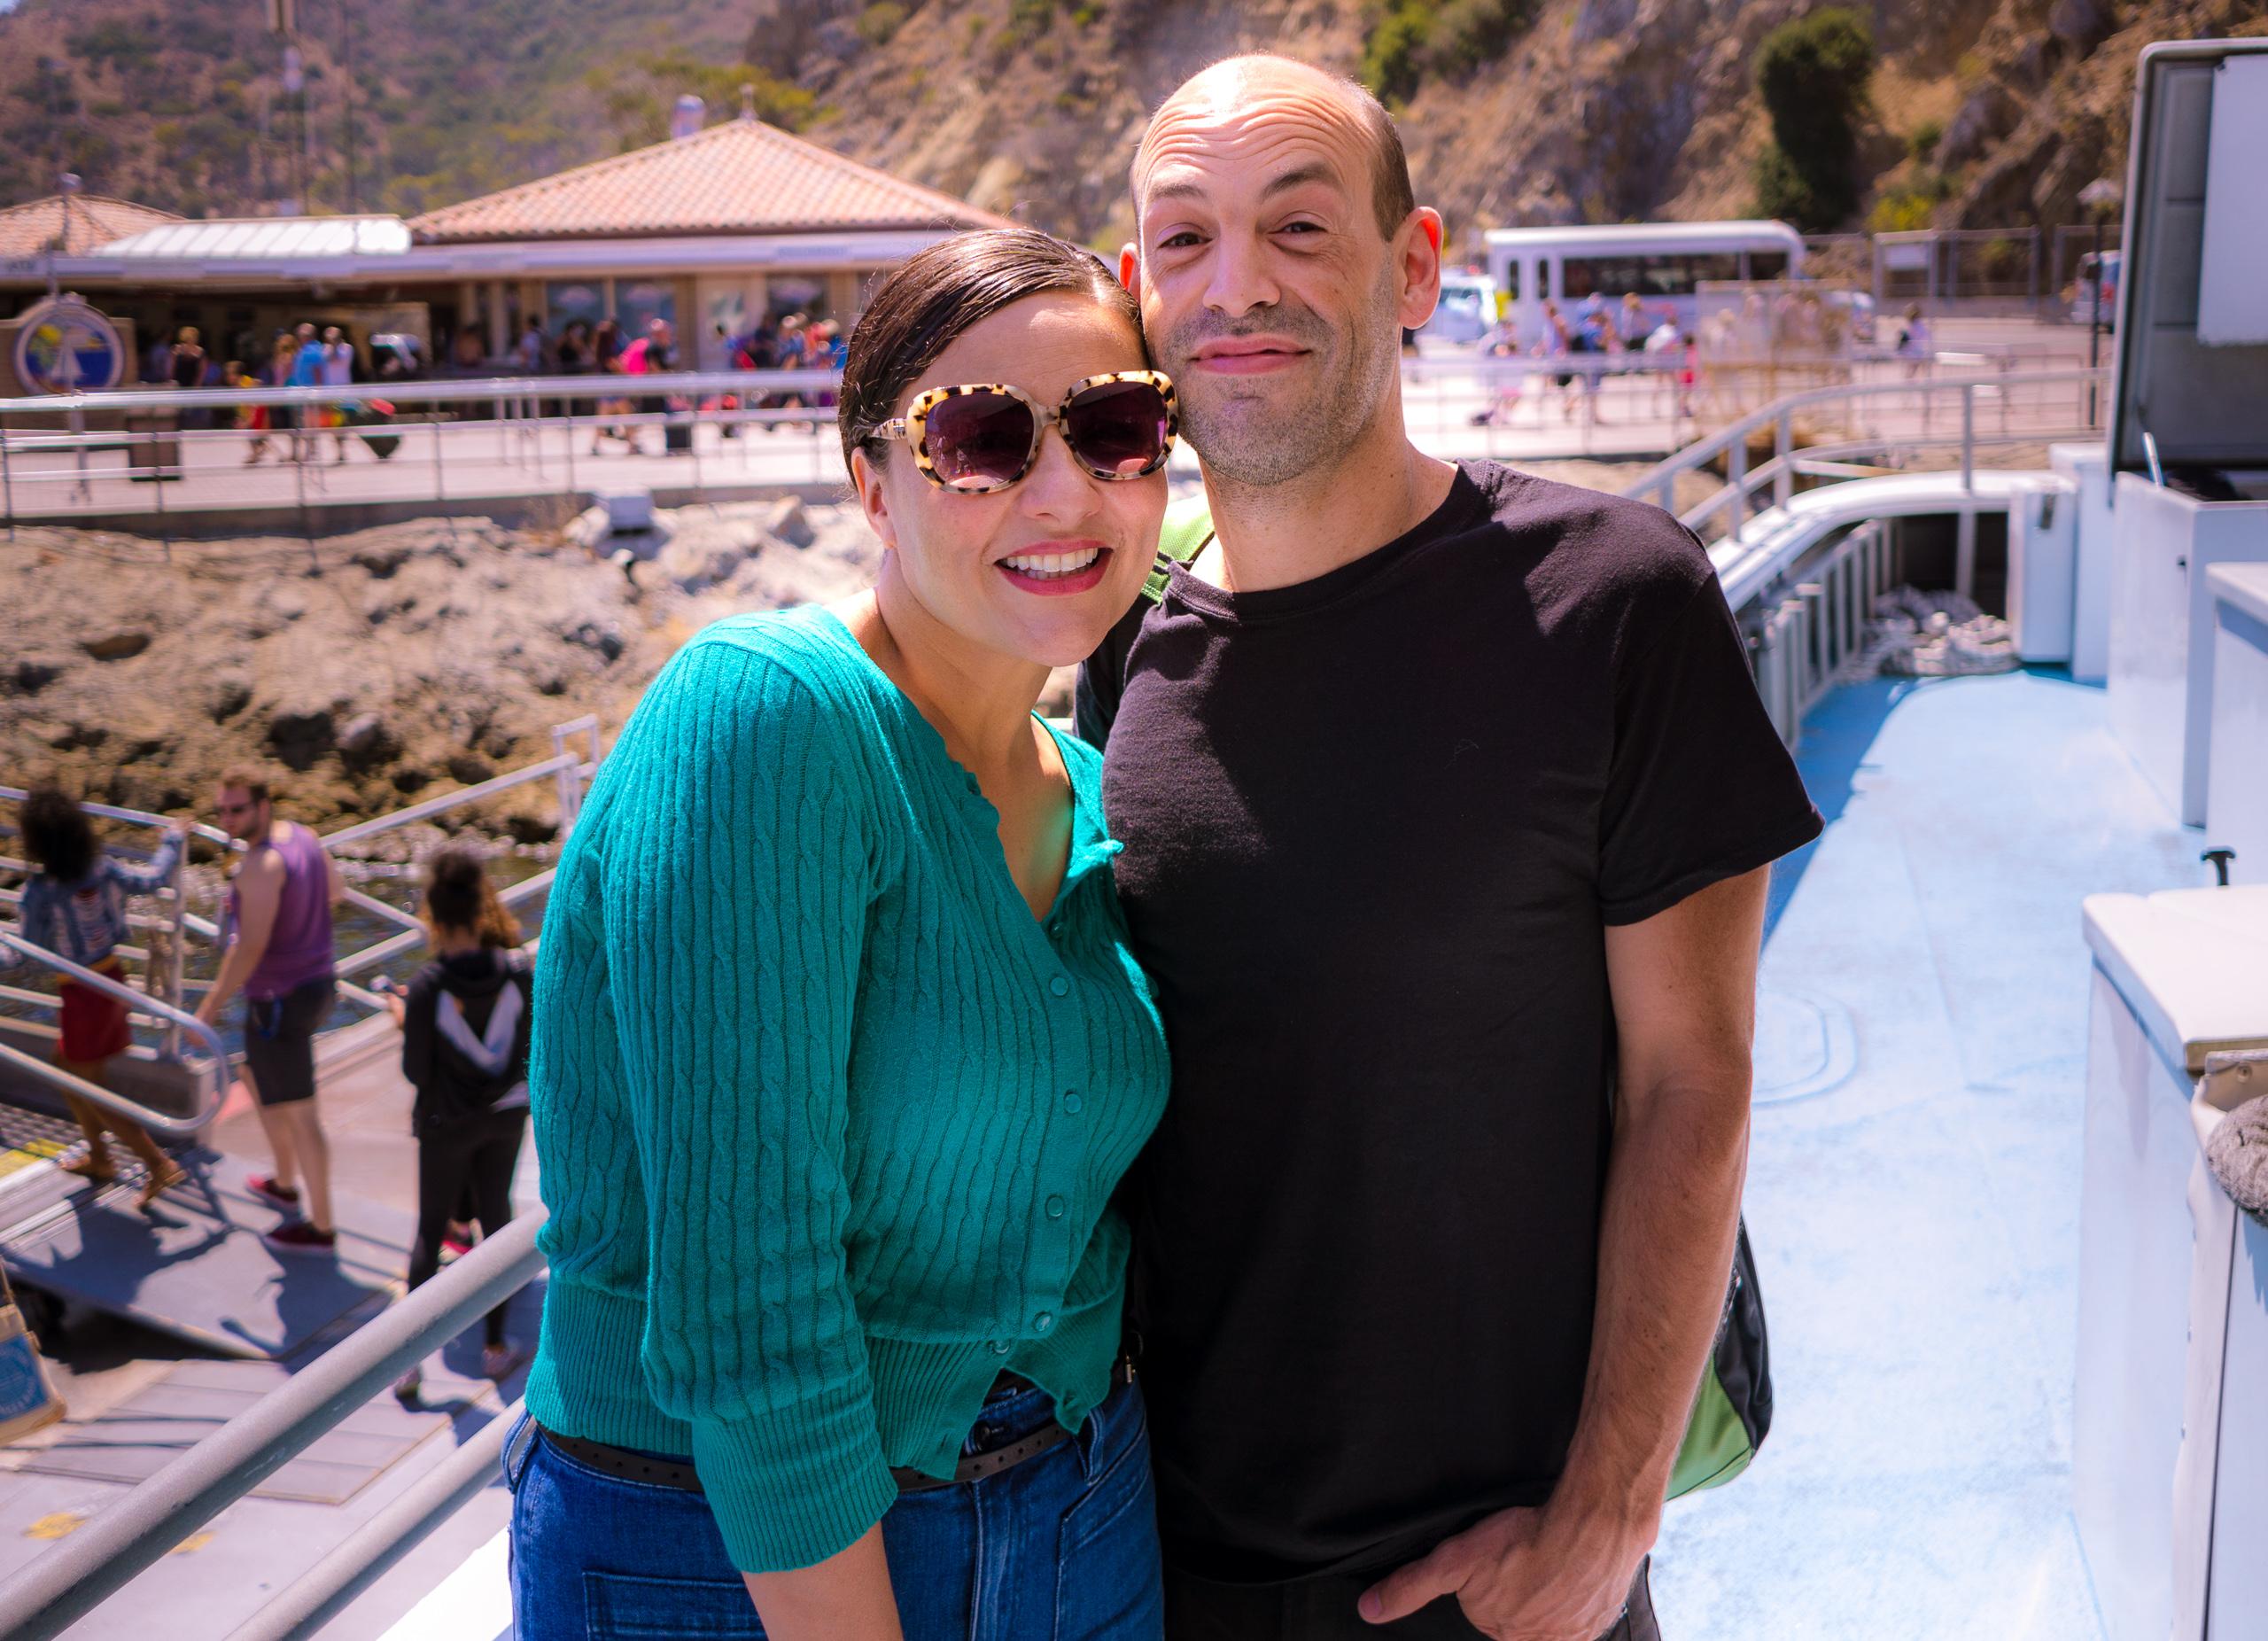 Jennifer & Alan arriving in Avalon, Catalina via Catalina Express